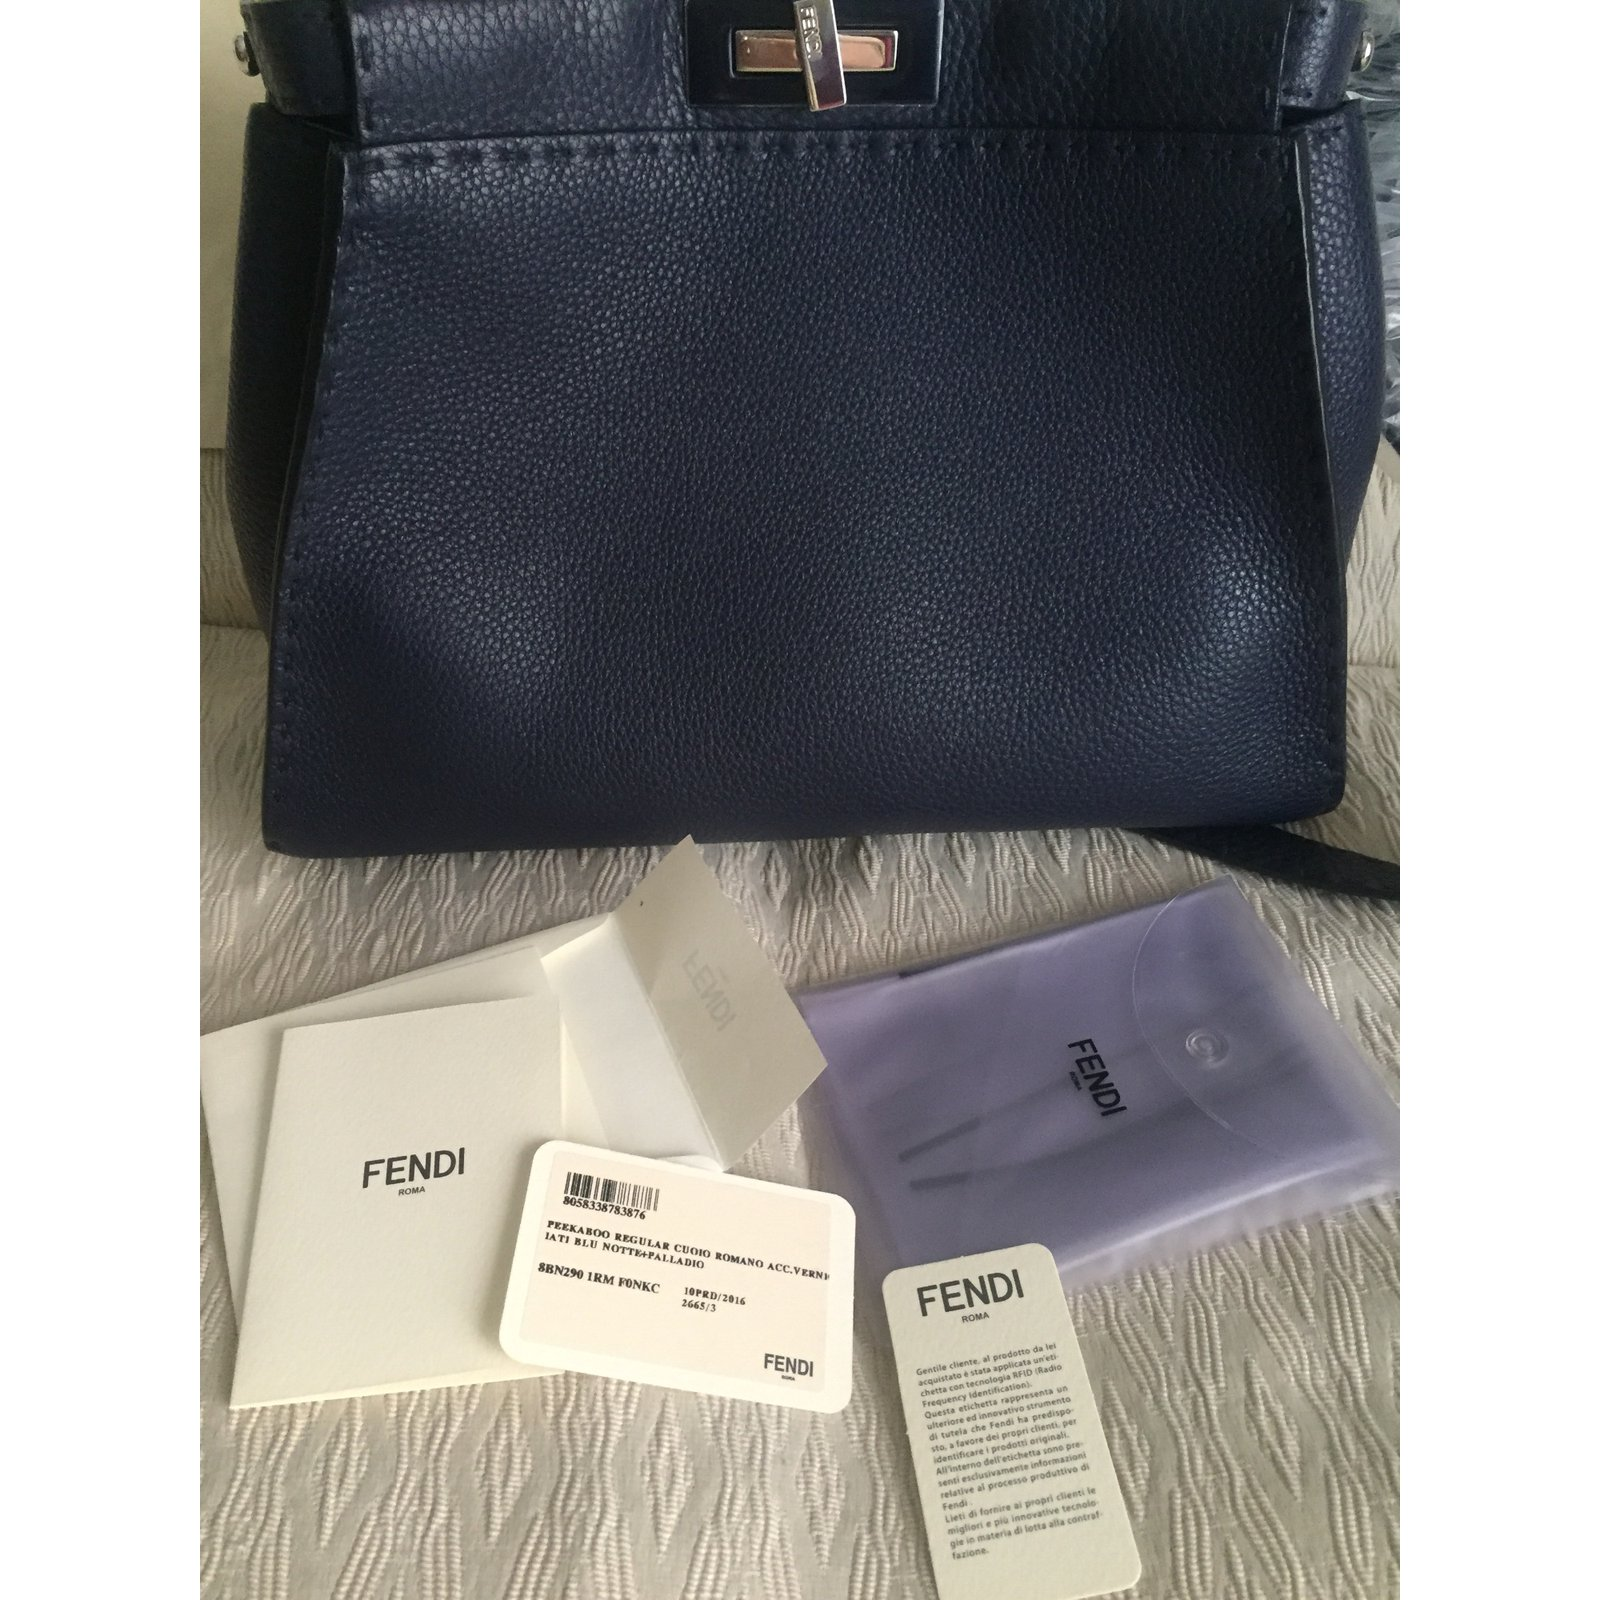 9513824e1be9 Fendi Peekaboo selleria Handbags Leather Blue ref.26644 - Joli Closet